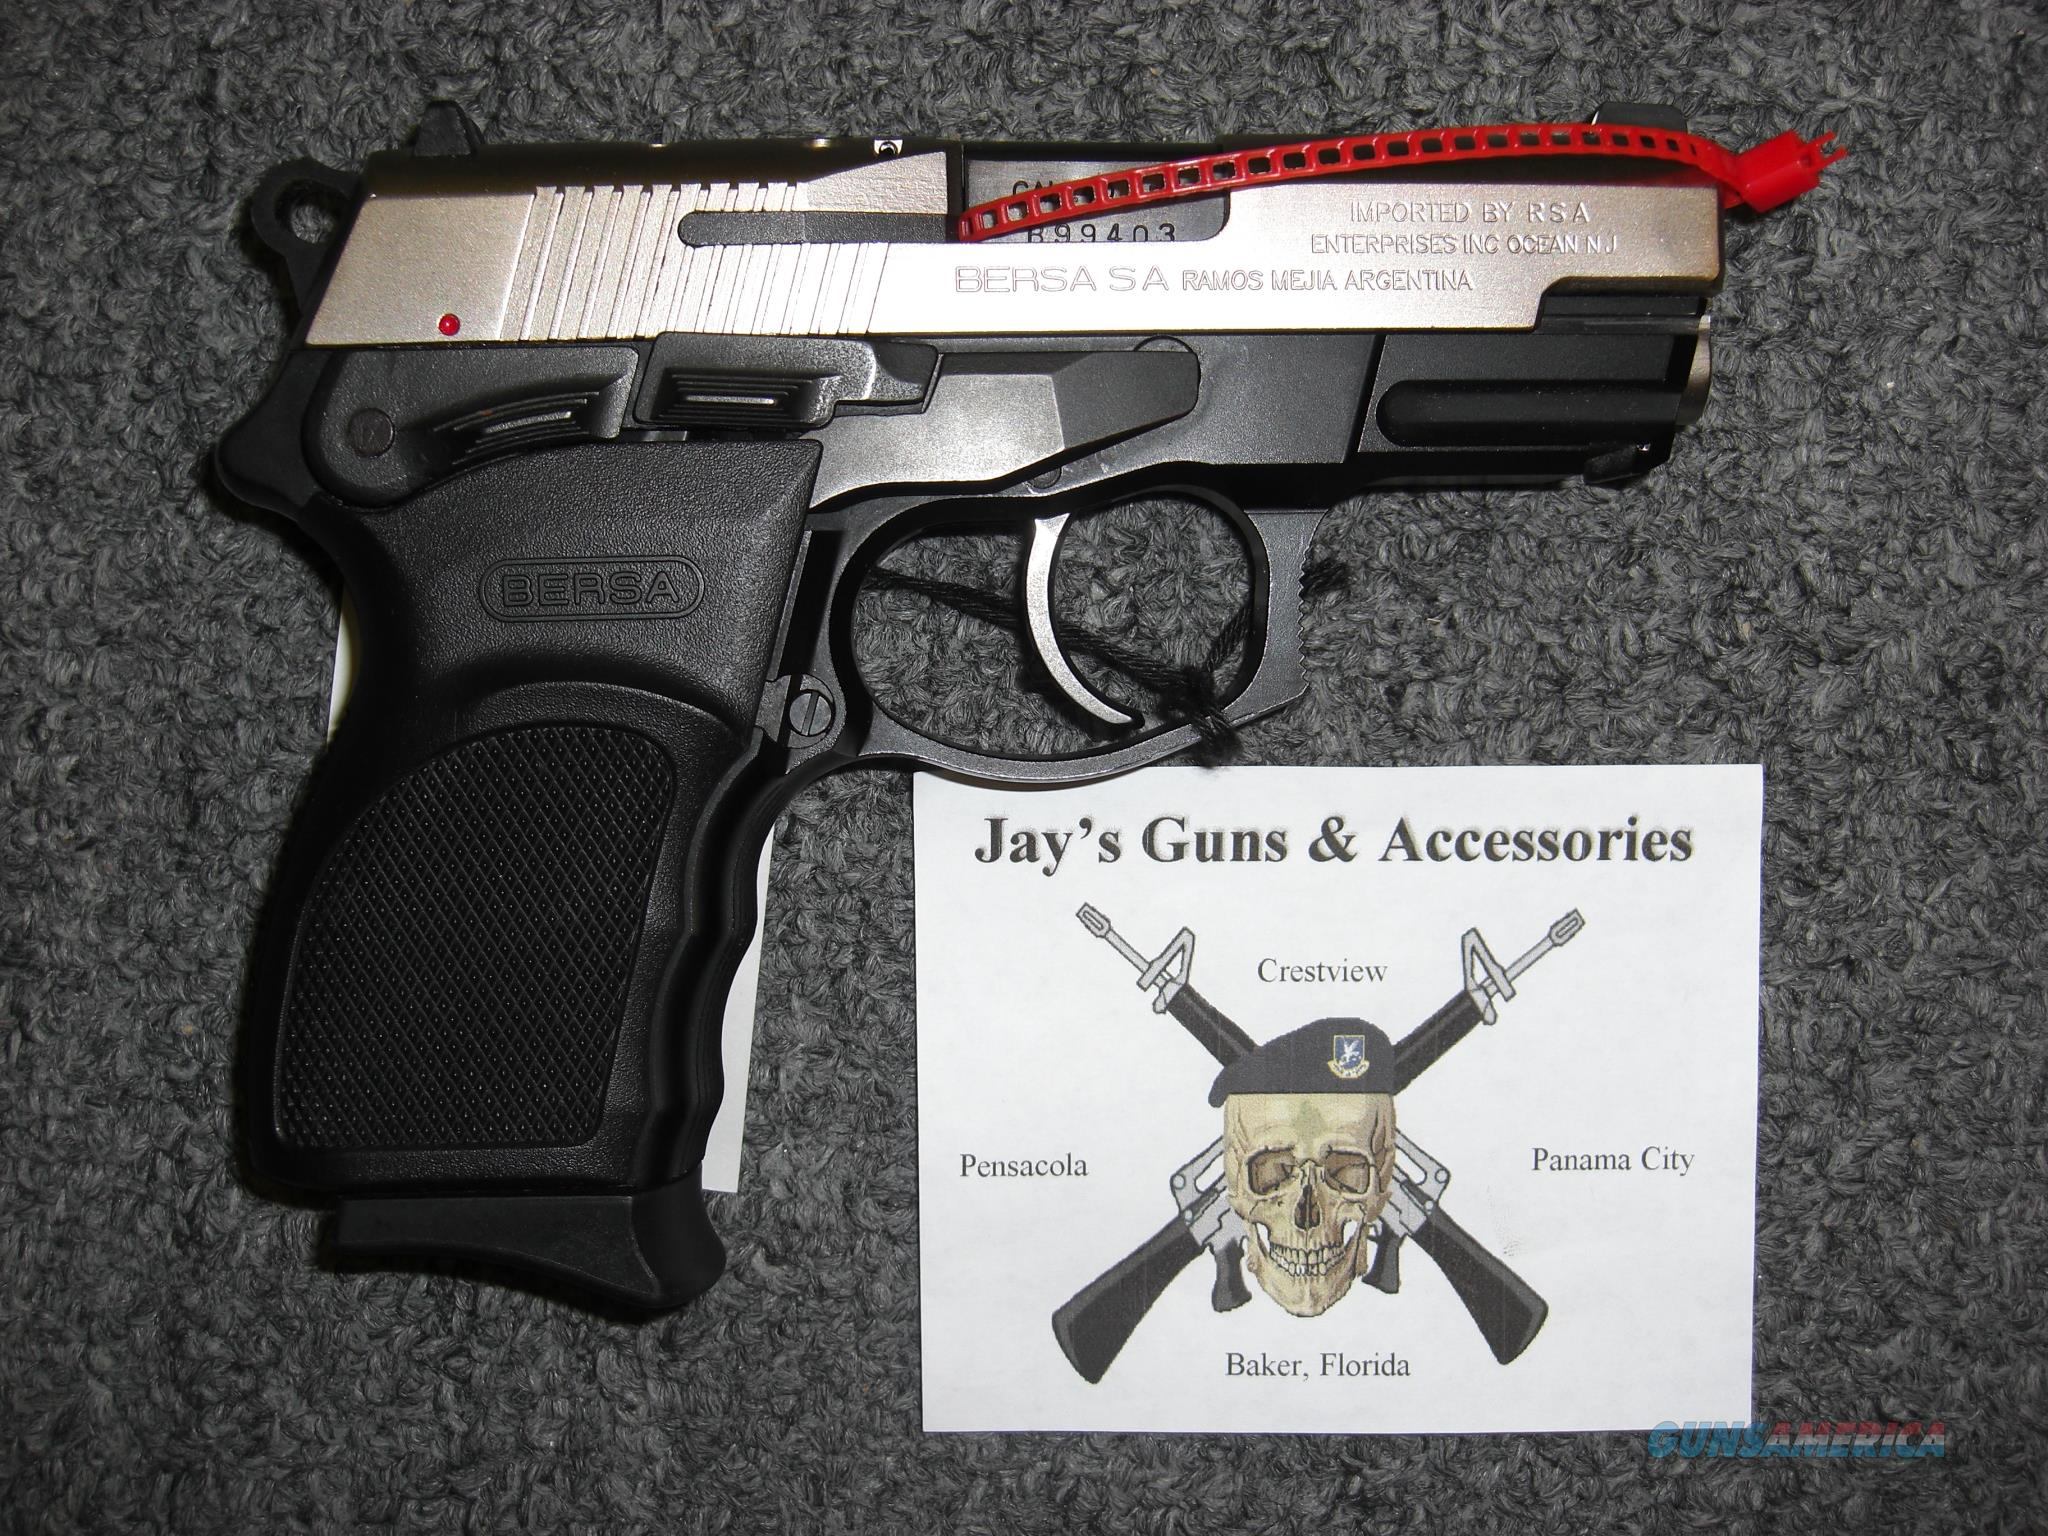 Ultra Compact 40 Cal Pistols